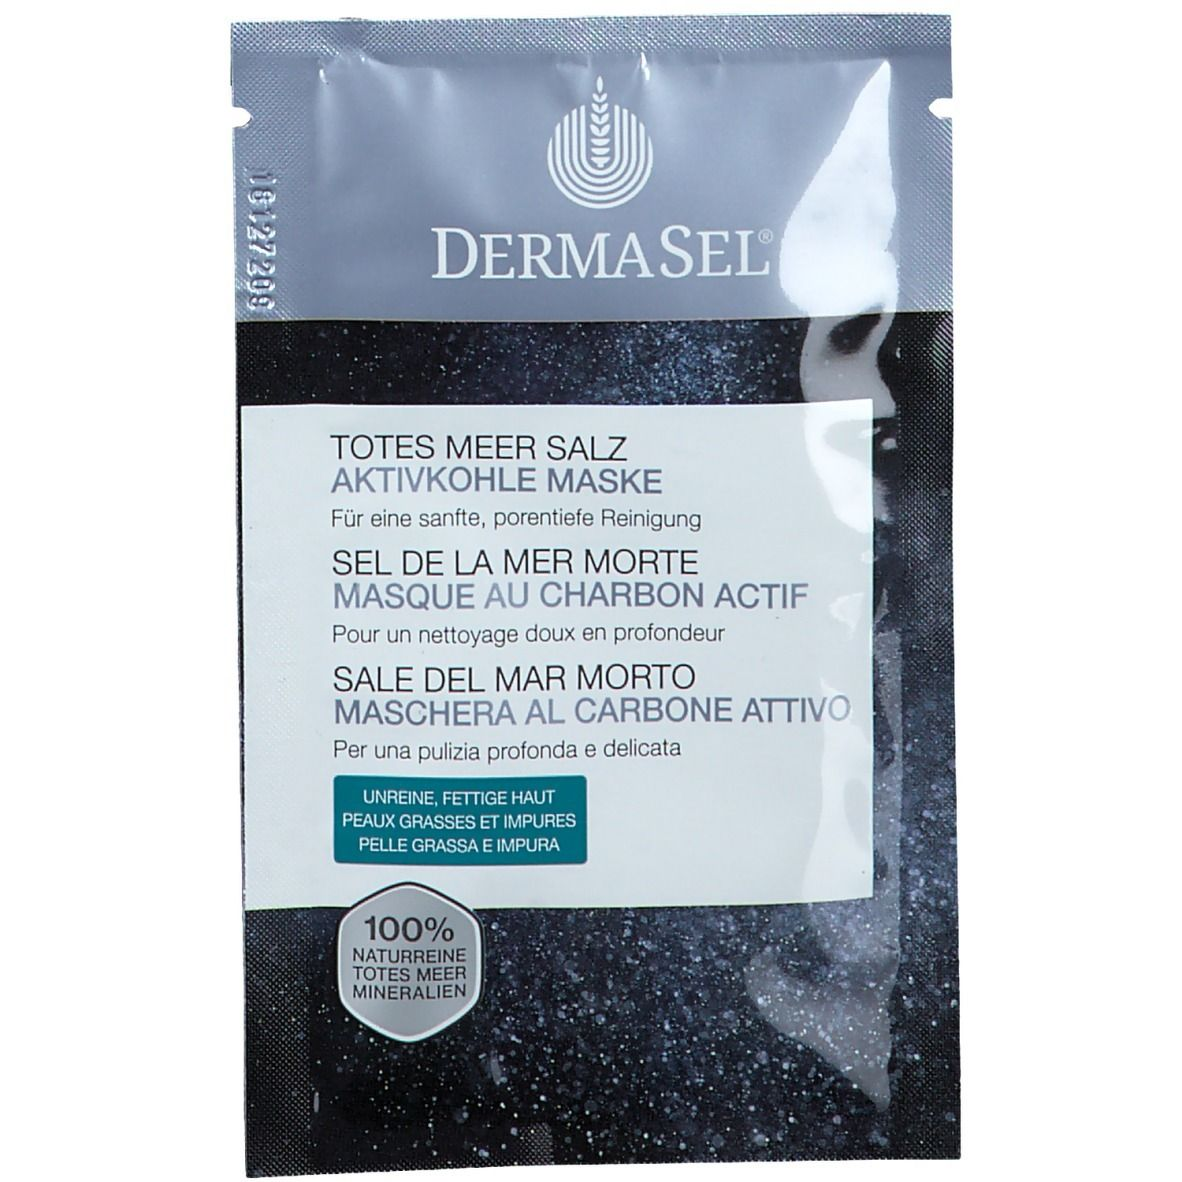 Image of DermaSel® Masque au charbon actif